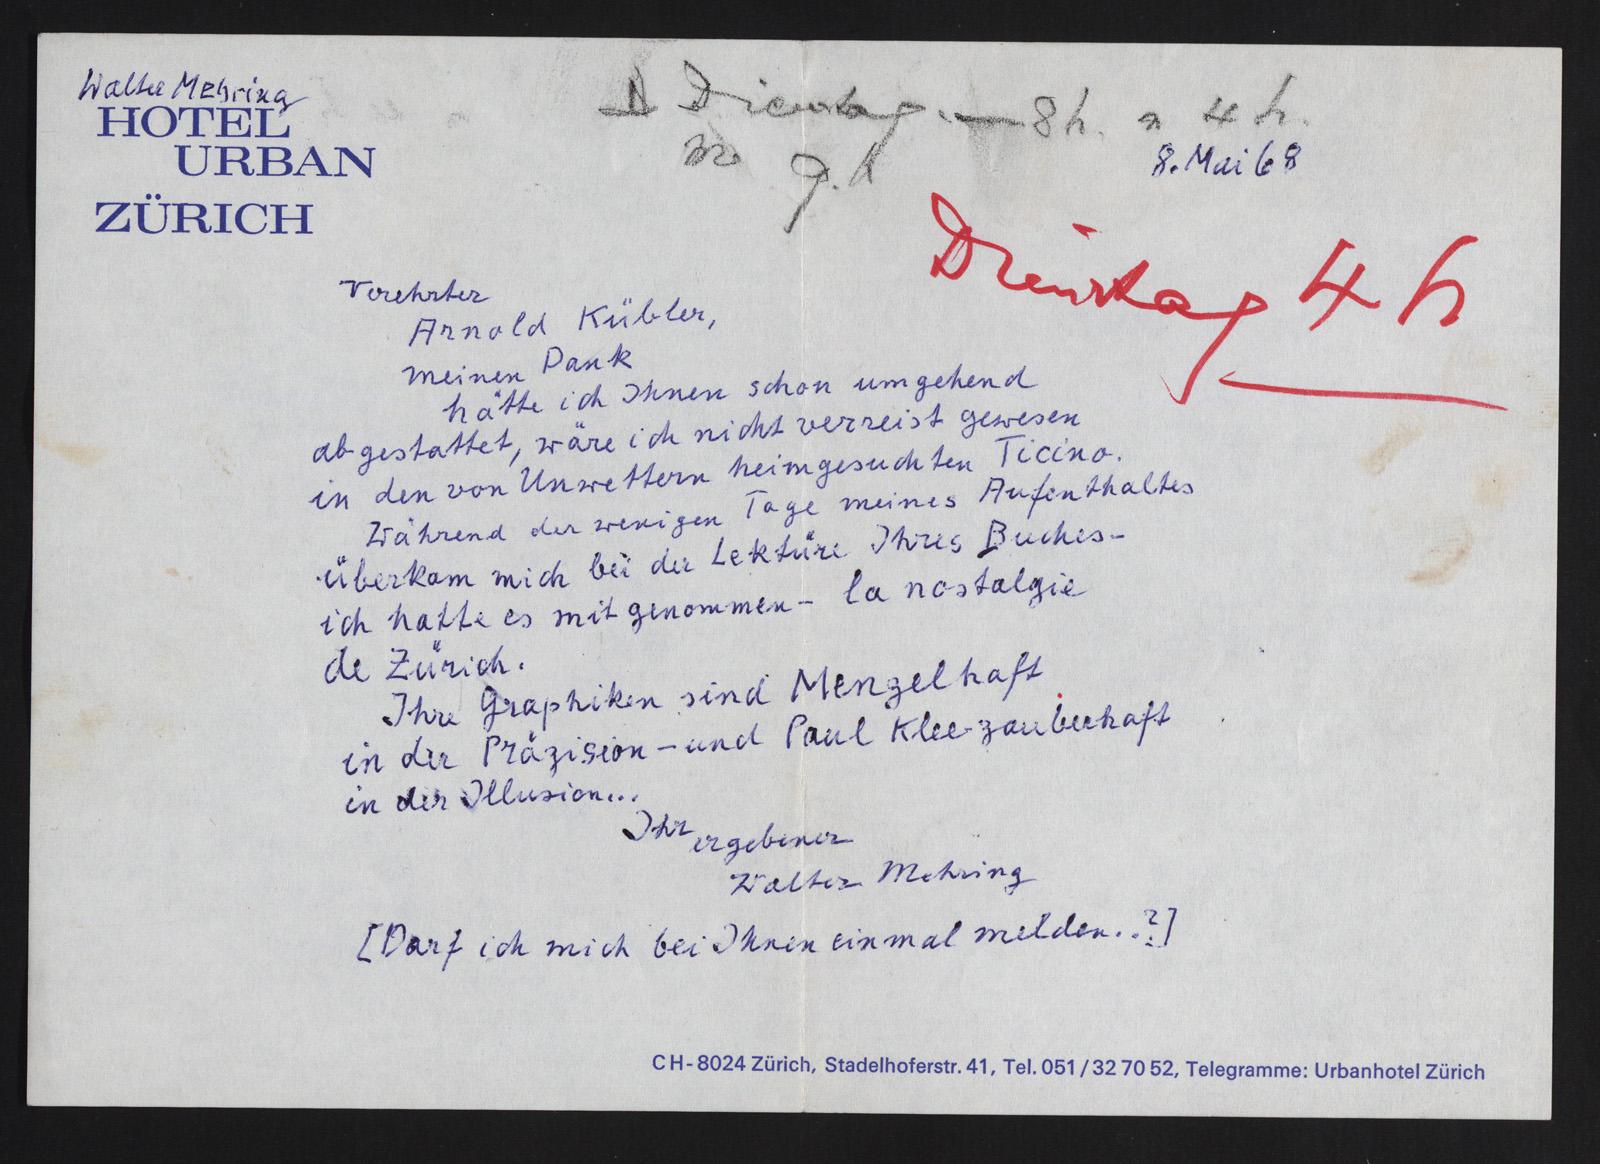 Walter Mehrings Brief an Arnold Kübler vom 8. Mai 1968